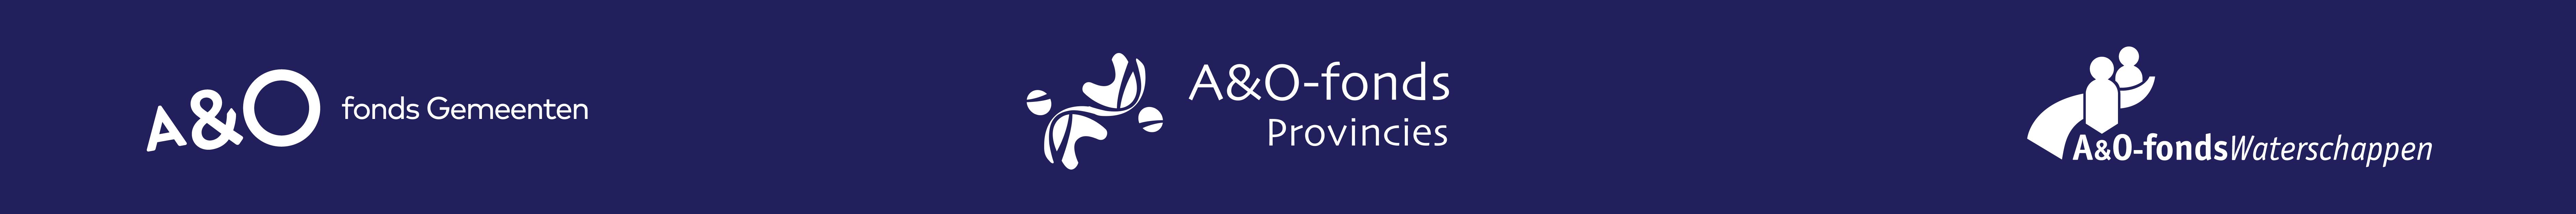 AO-fondsen-drie-fondsen-footer-webinars website footer